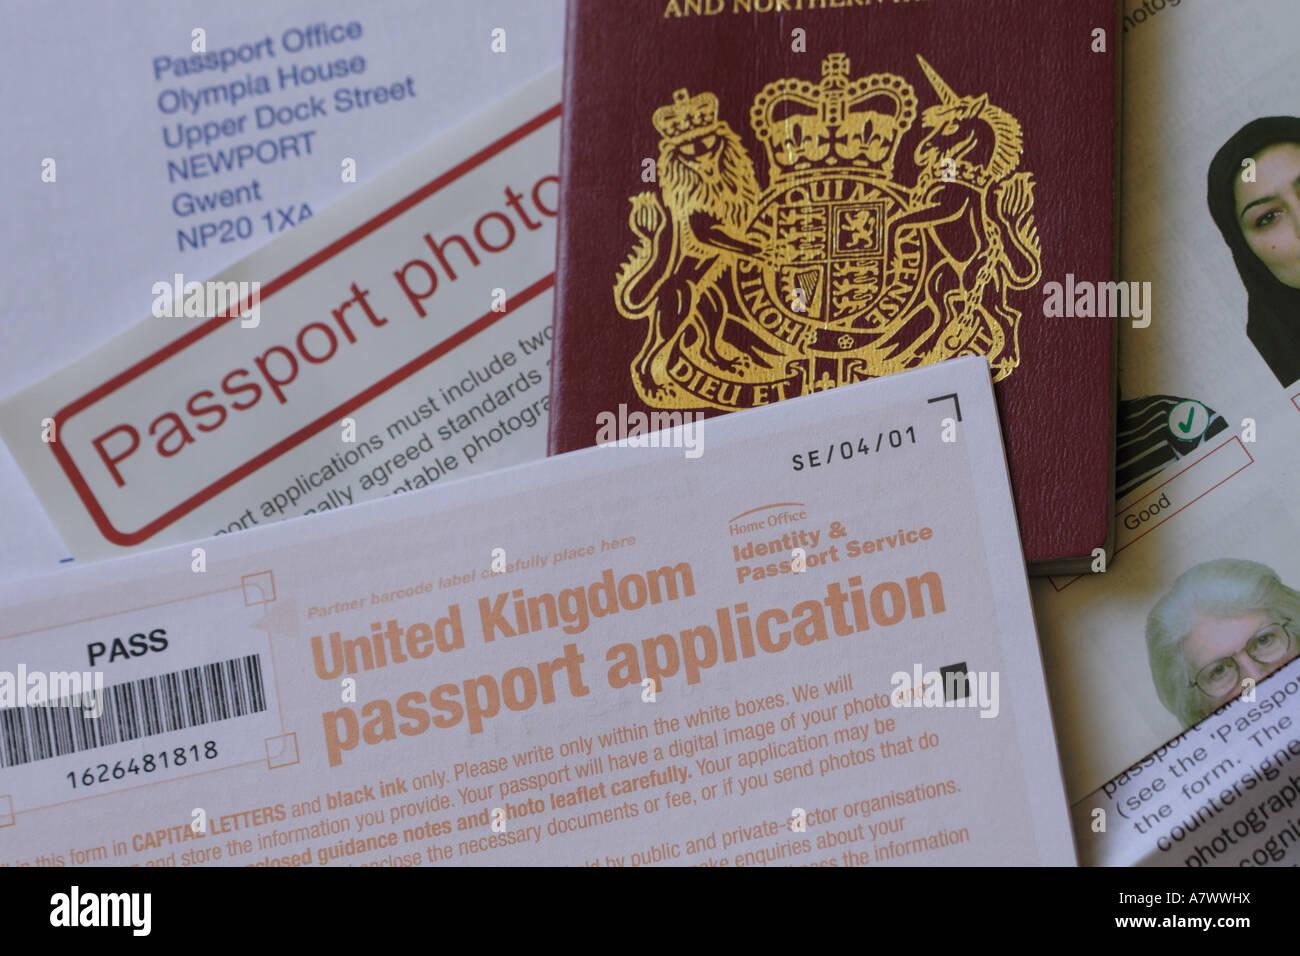 Uk passport application form stock photo royalty free image uk passport application form falaconquin